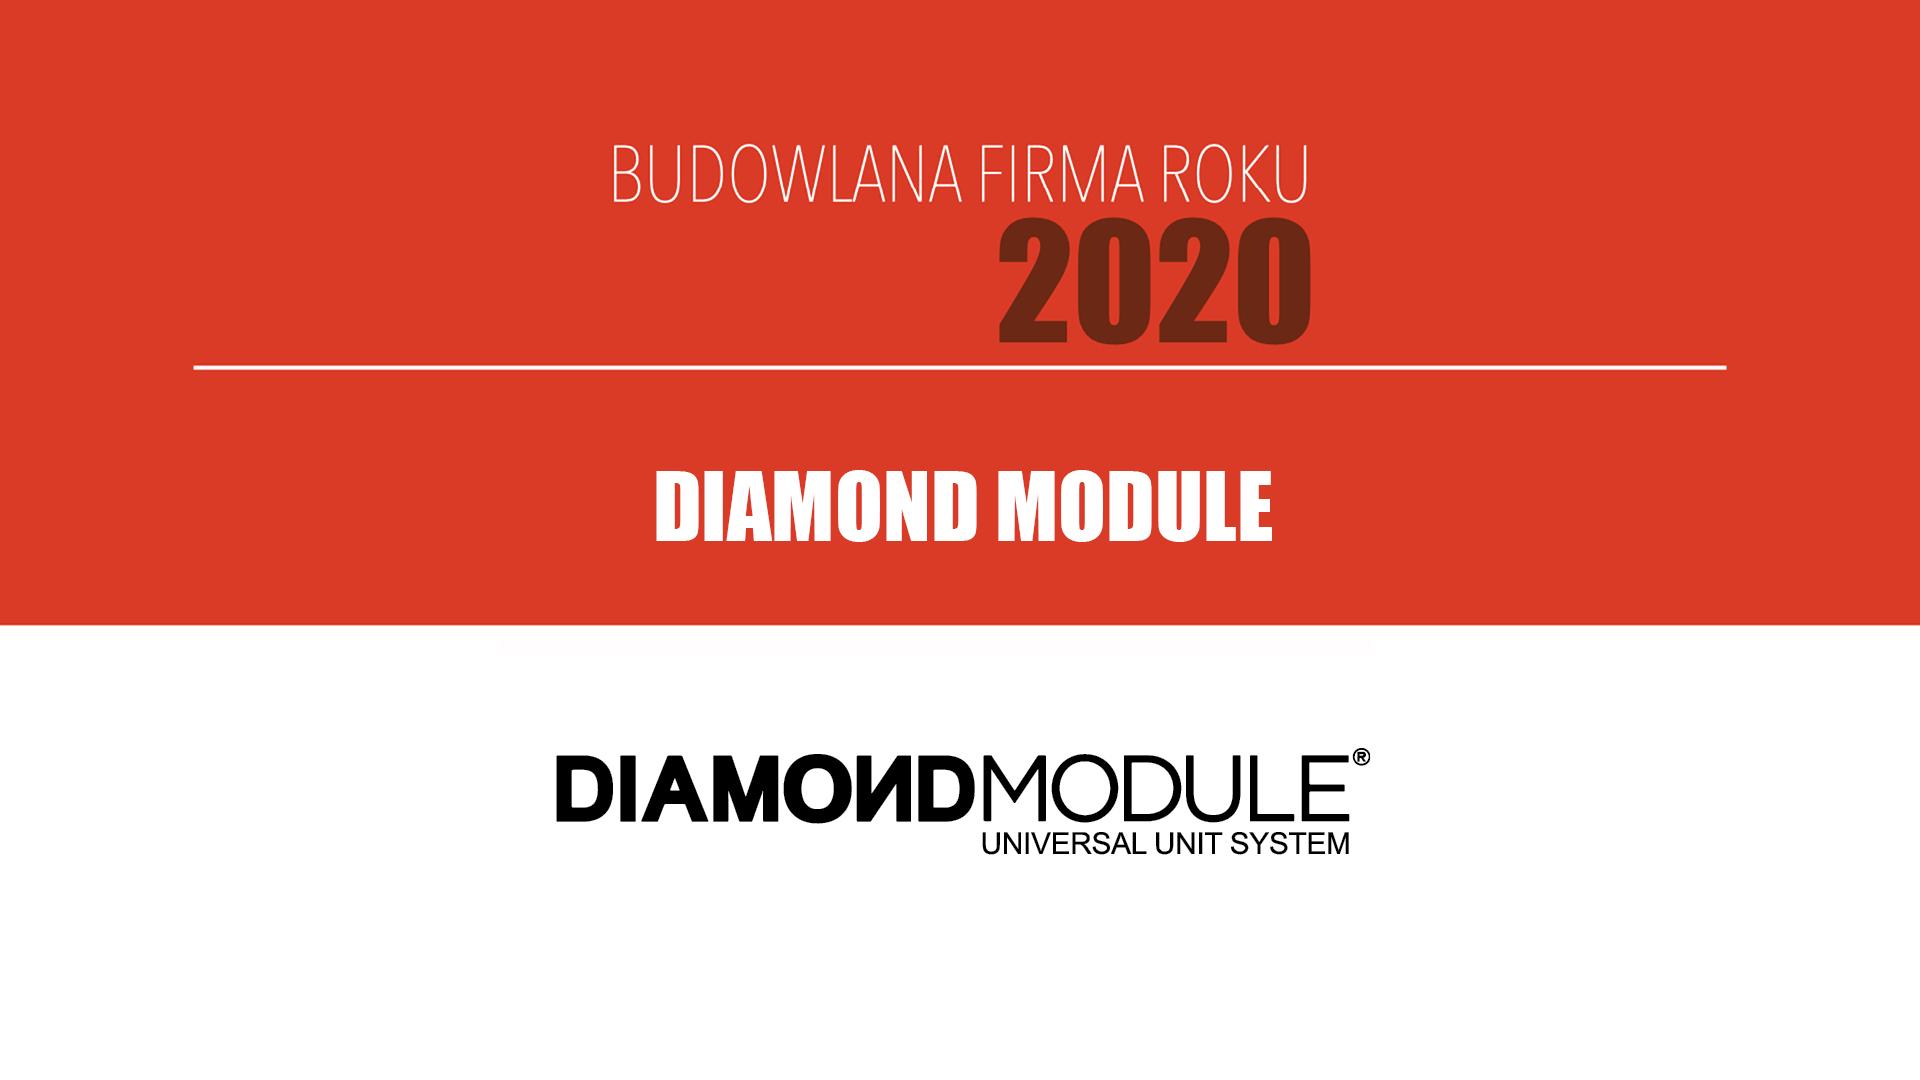 DIAMOND MODULE – Budowlana Firma Roku 2020